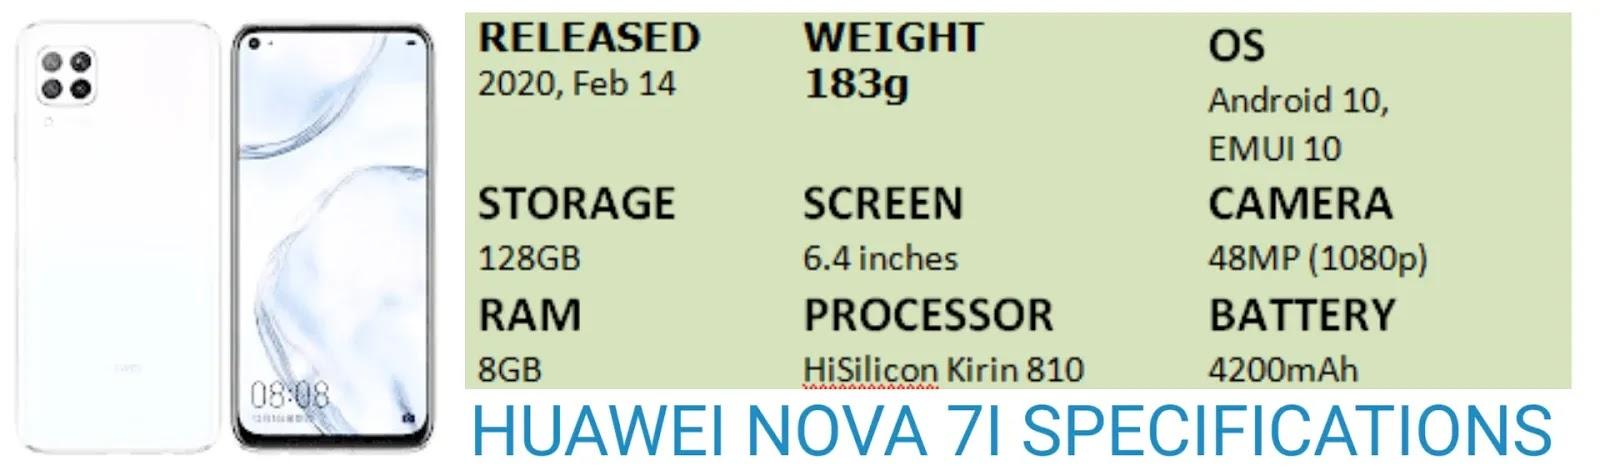 huawei nova 7i,nova 7i,huawei nova 7i specifications,huawei nova 7i prices & more